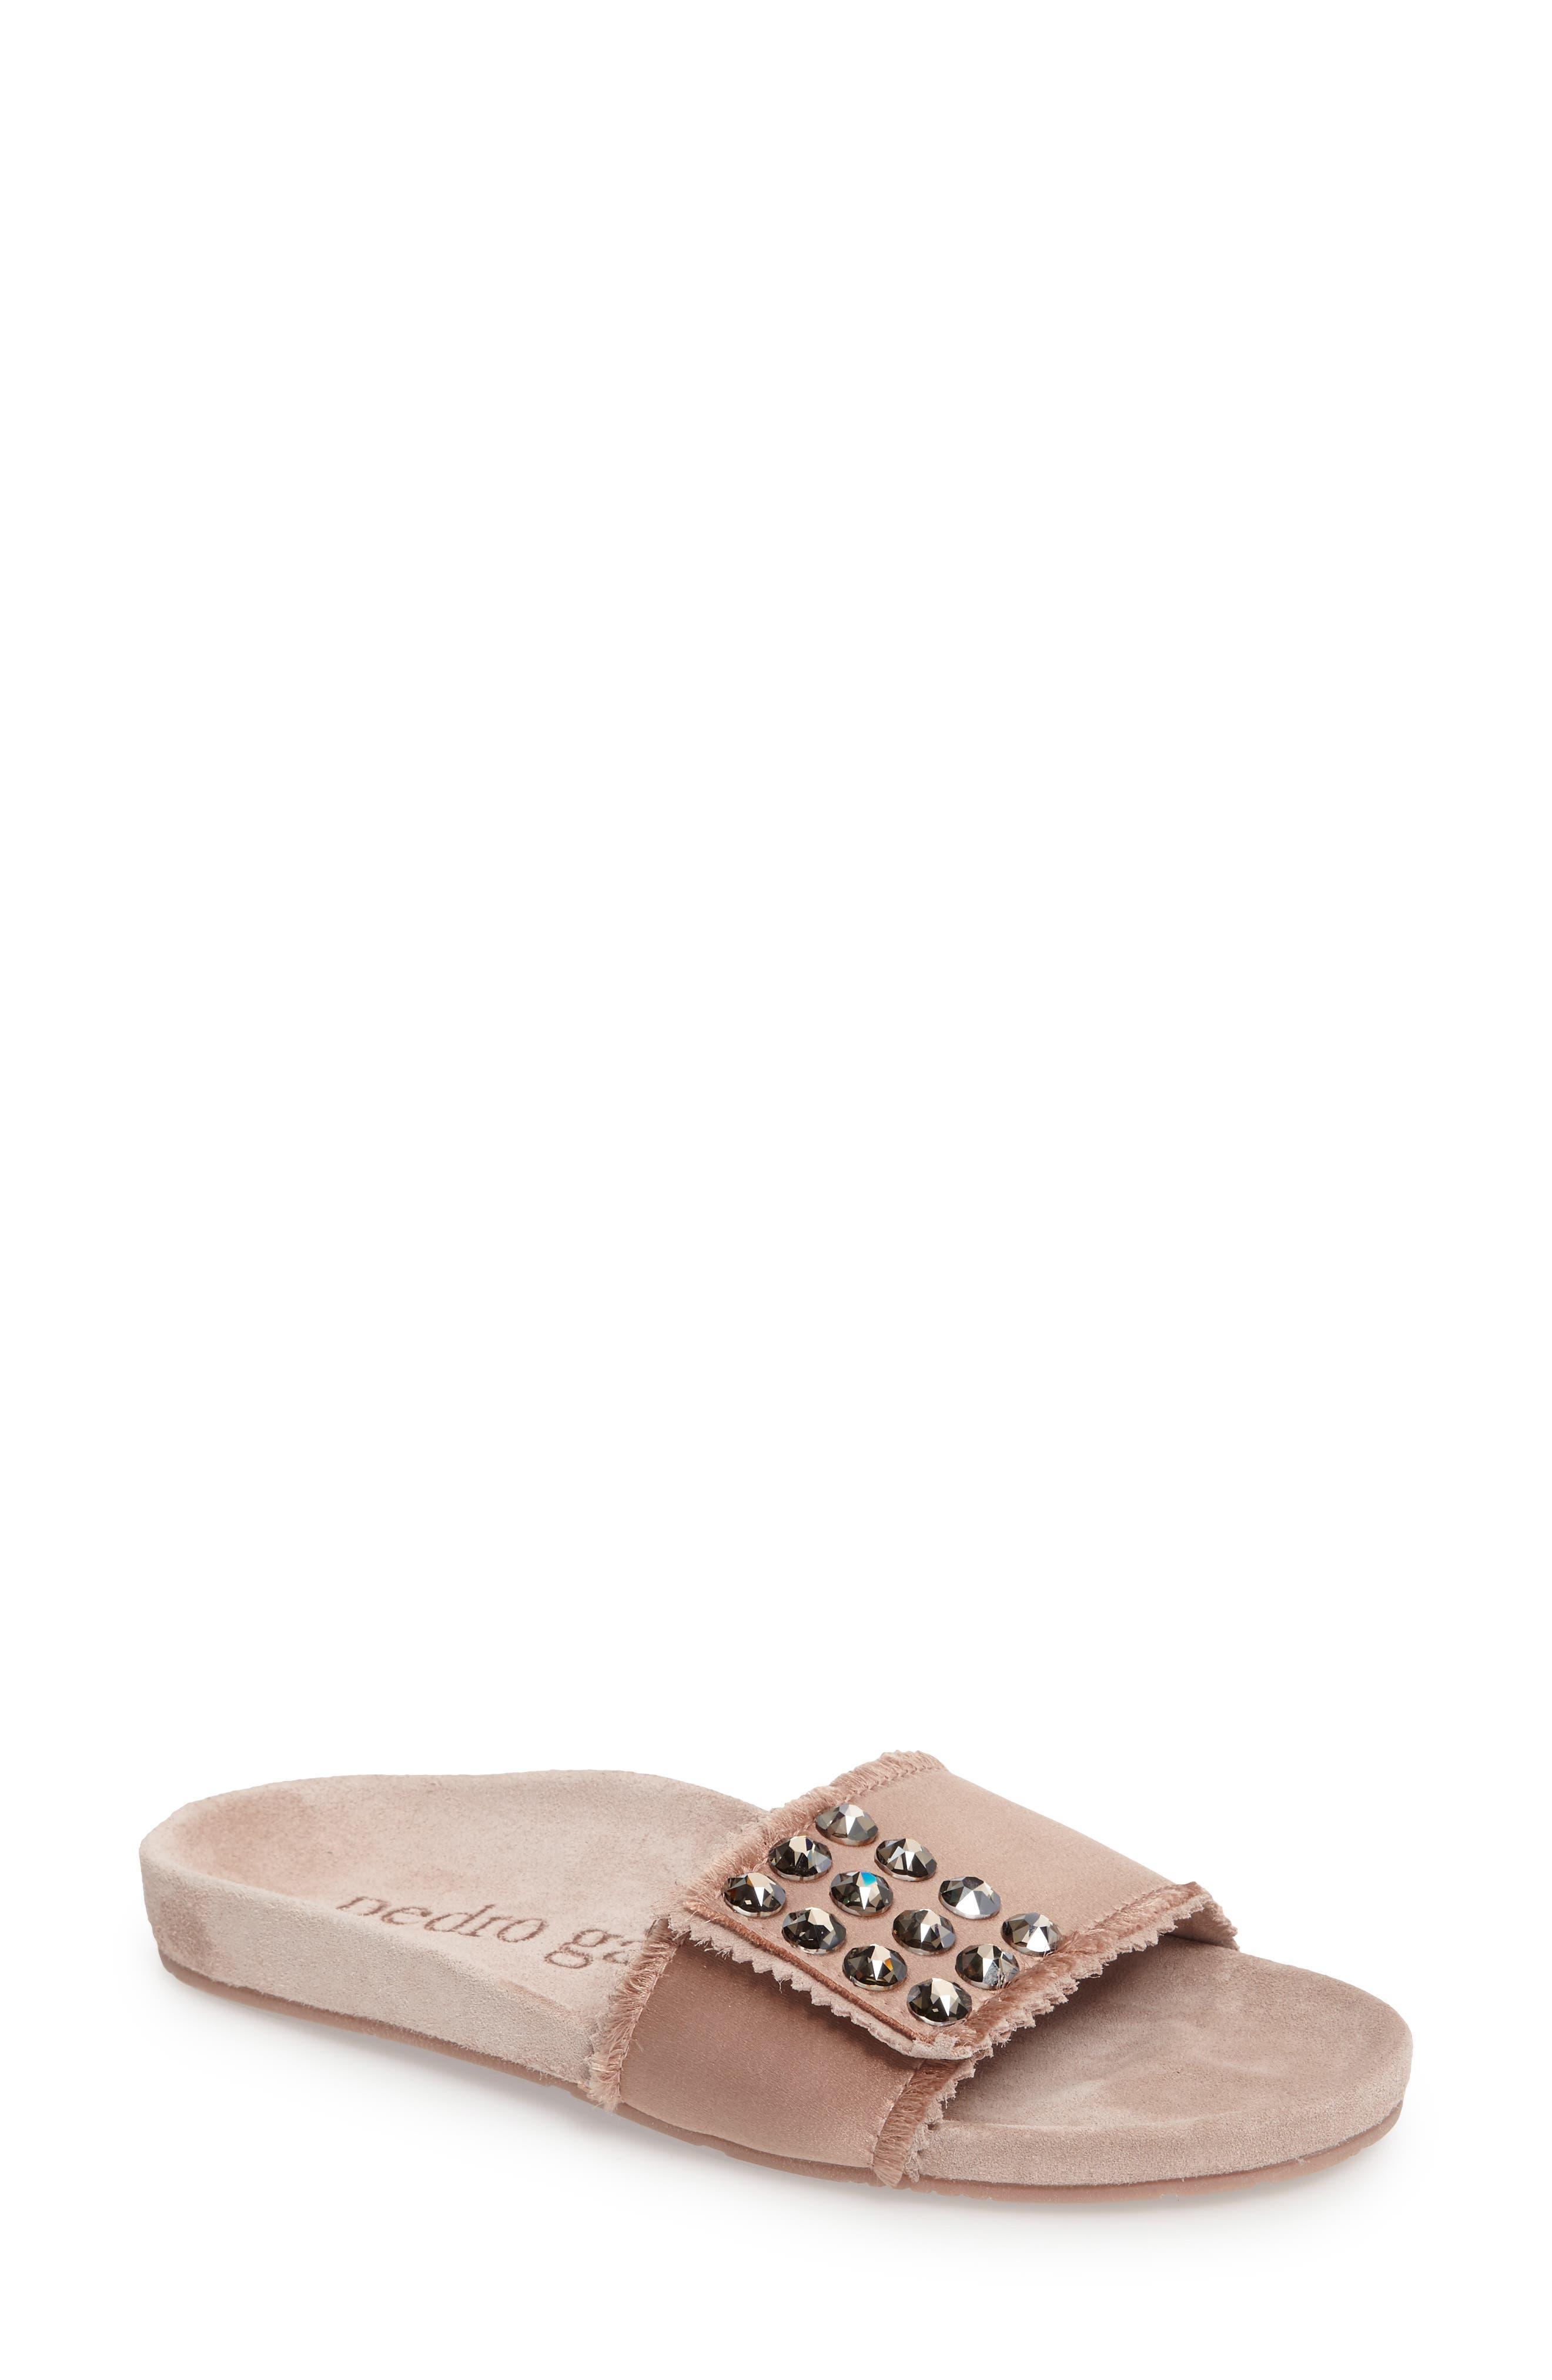 PEDRO GARCIA Arabella Crystal Slide Sandal